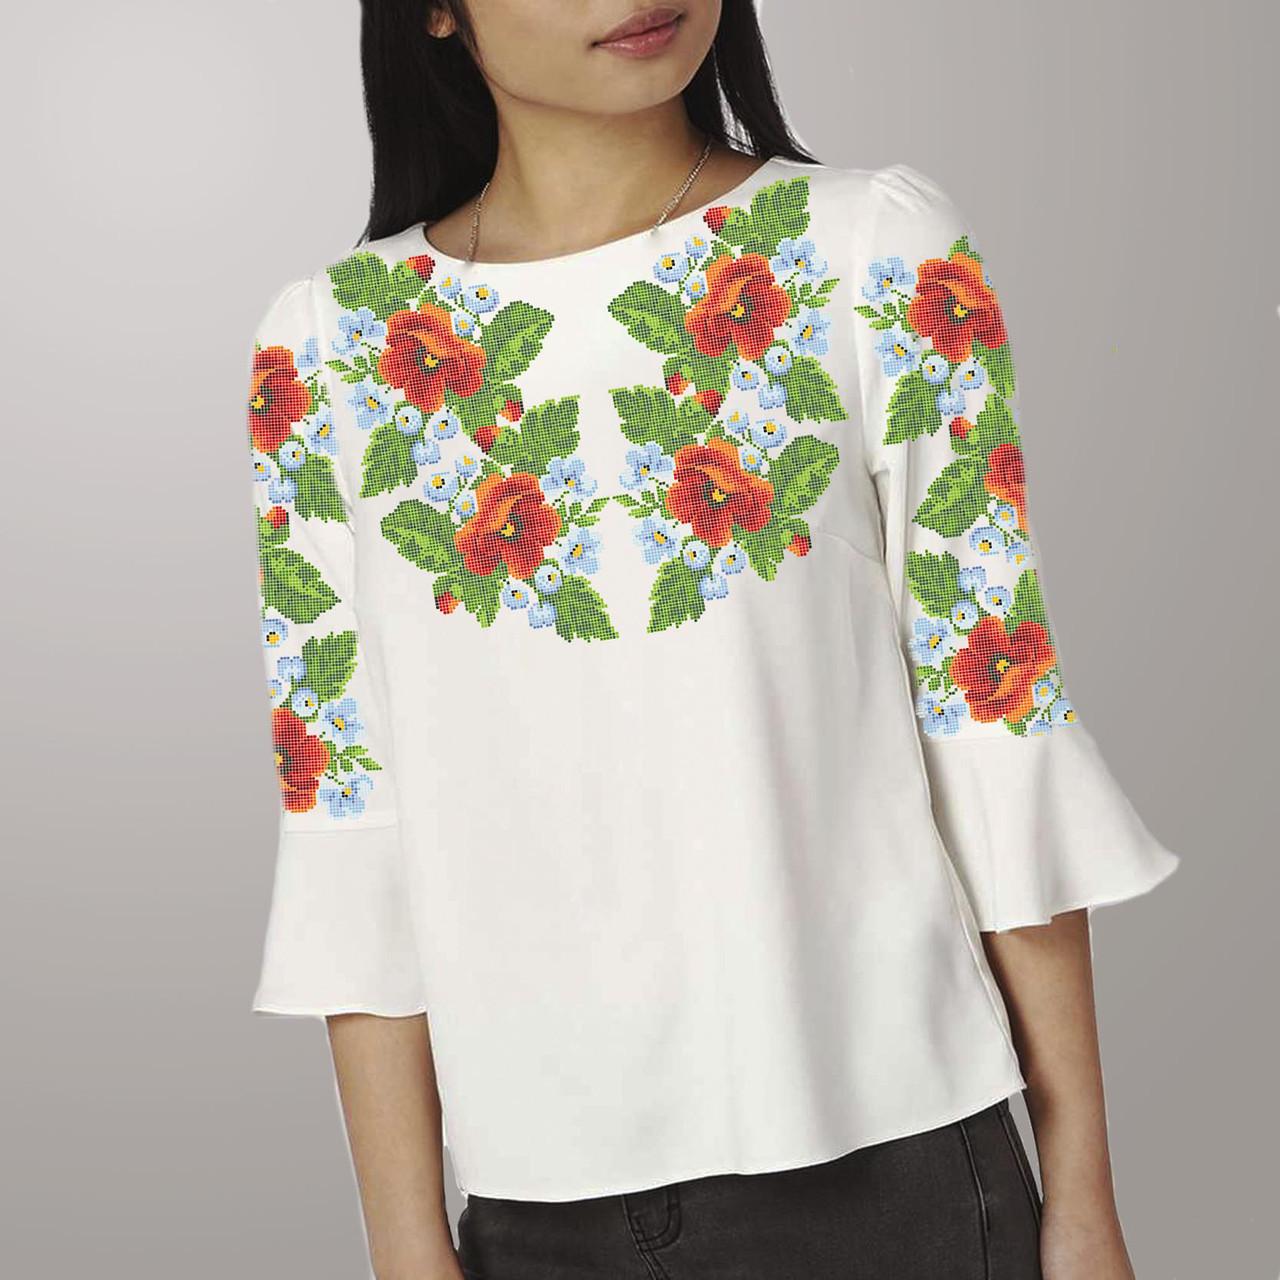 Заготовка вышиванки женской сорочки / блузы для вышивки бисером «Розкіш літа» Домоткан (білий)